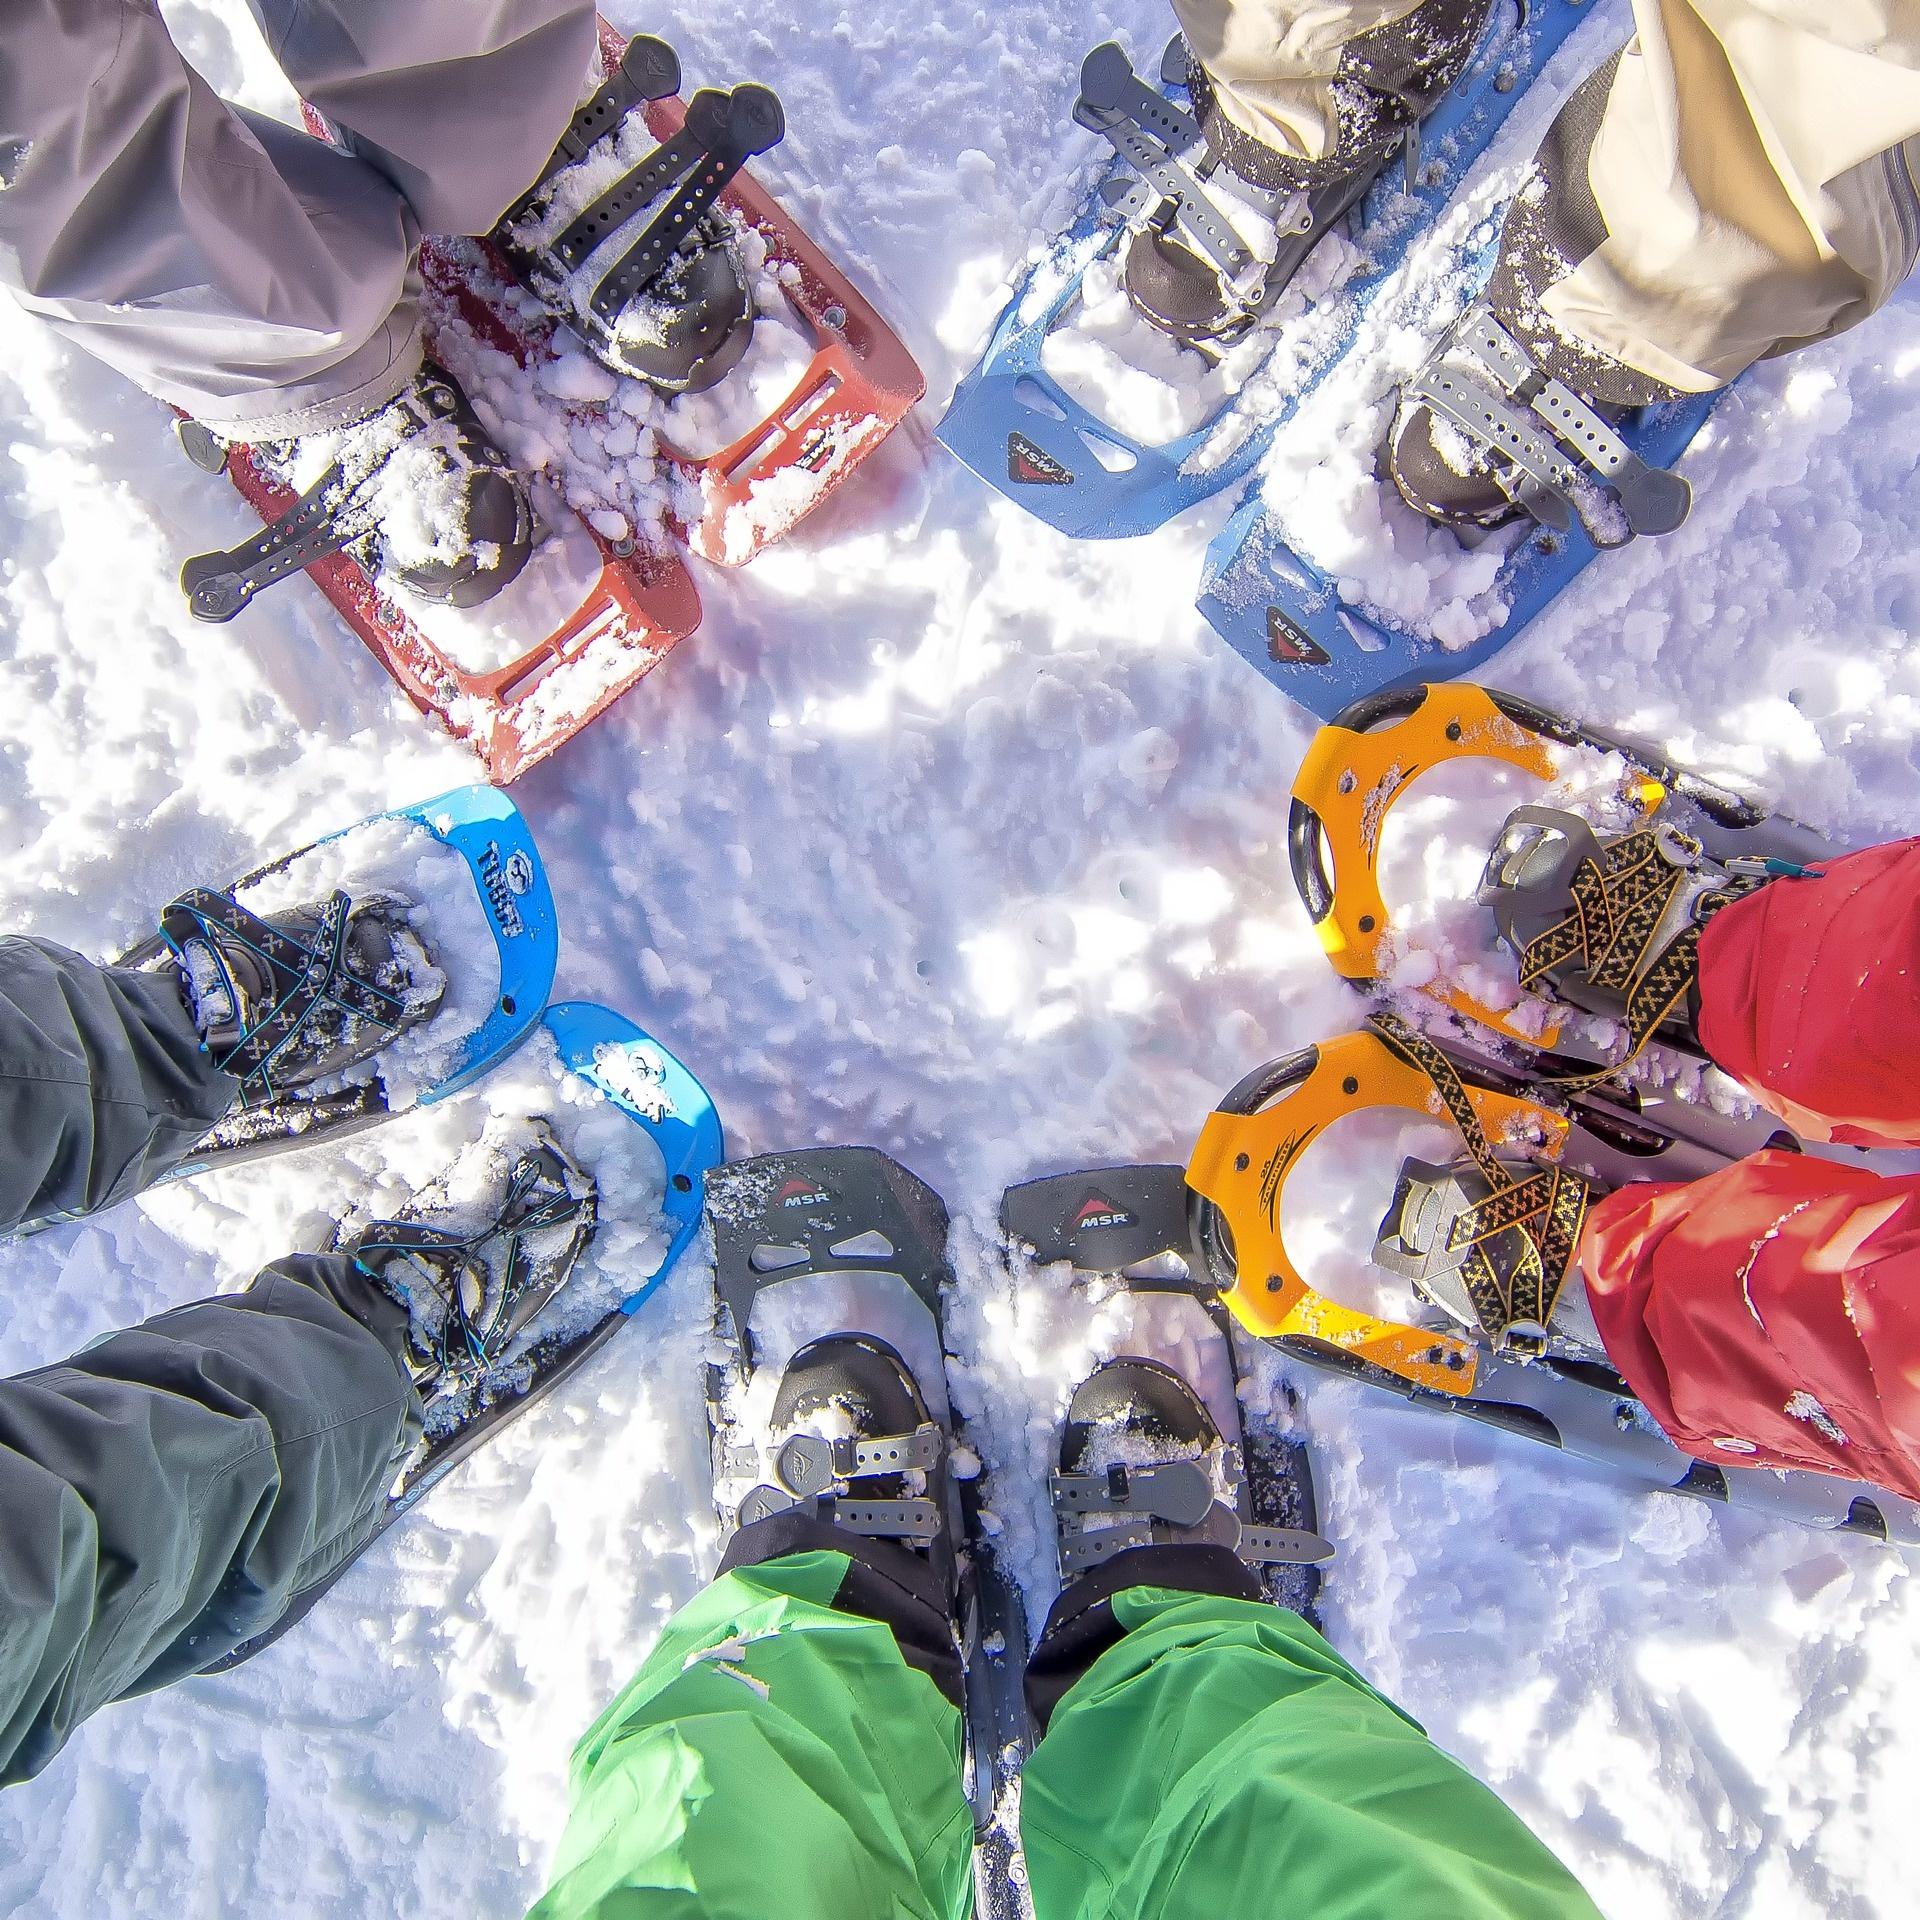 BigRock Recieves Snowshoeing Grant